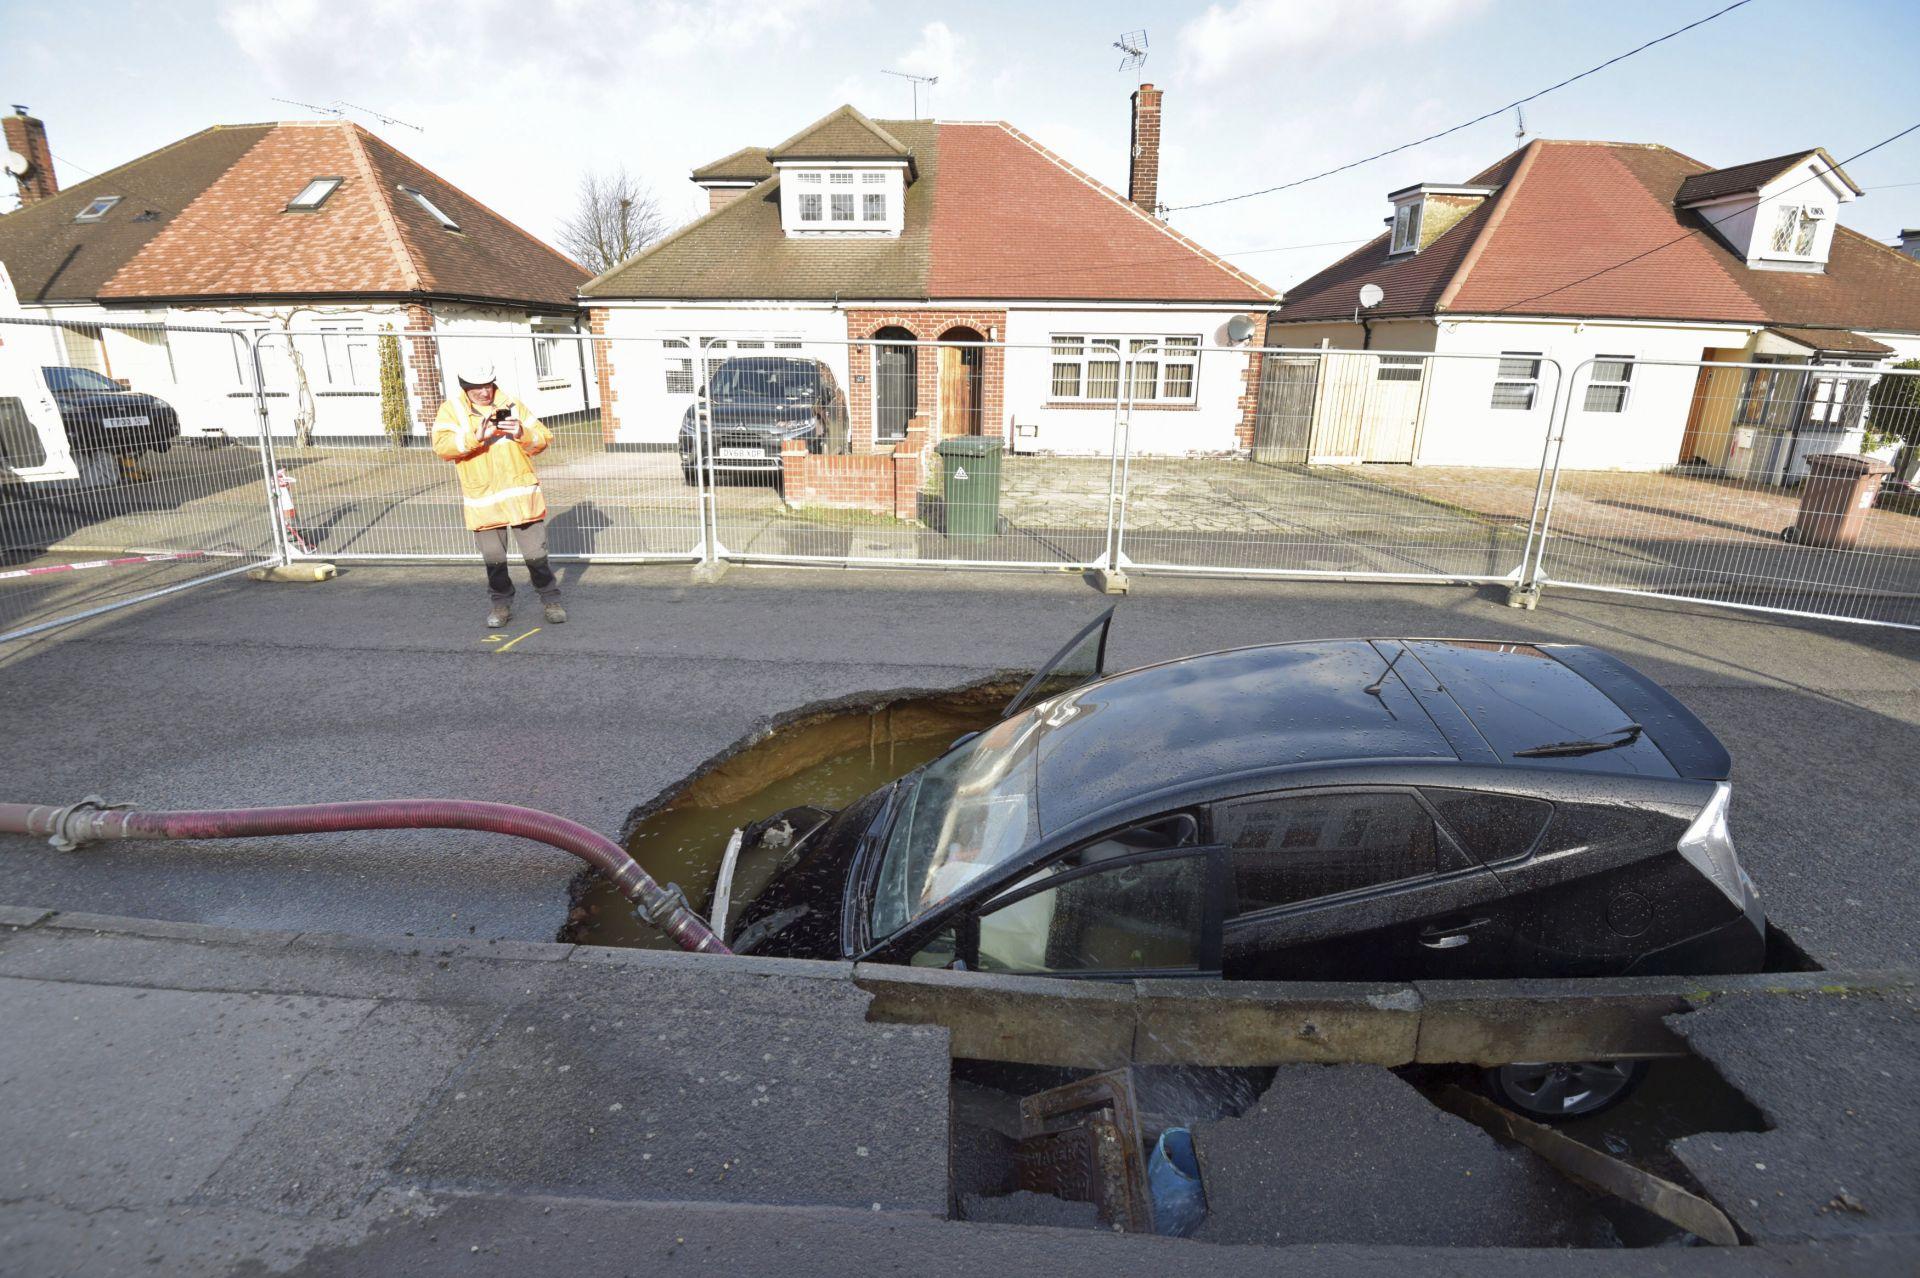 Огромна дупка се появи на улица в британското градче Брентуд след бурята Киара